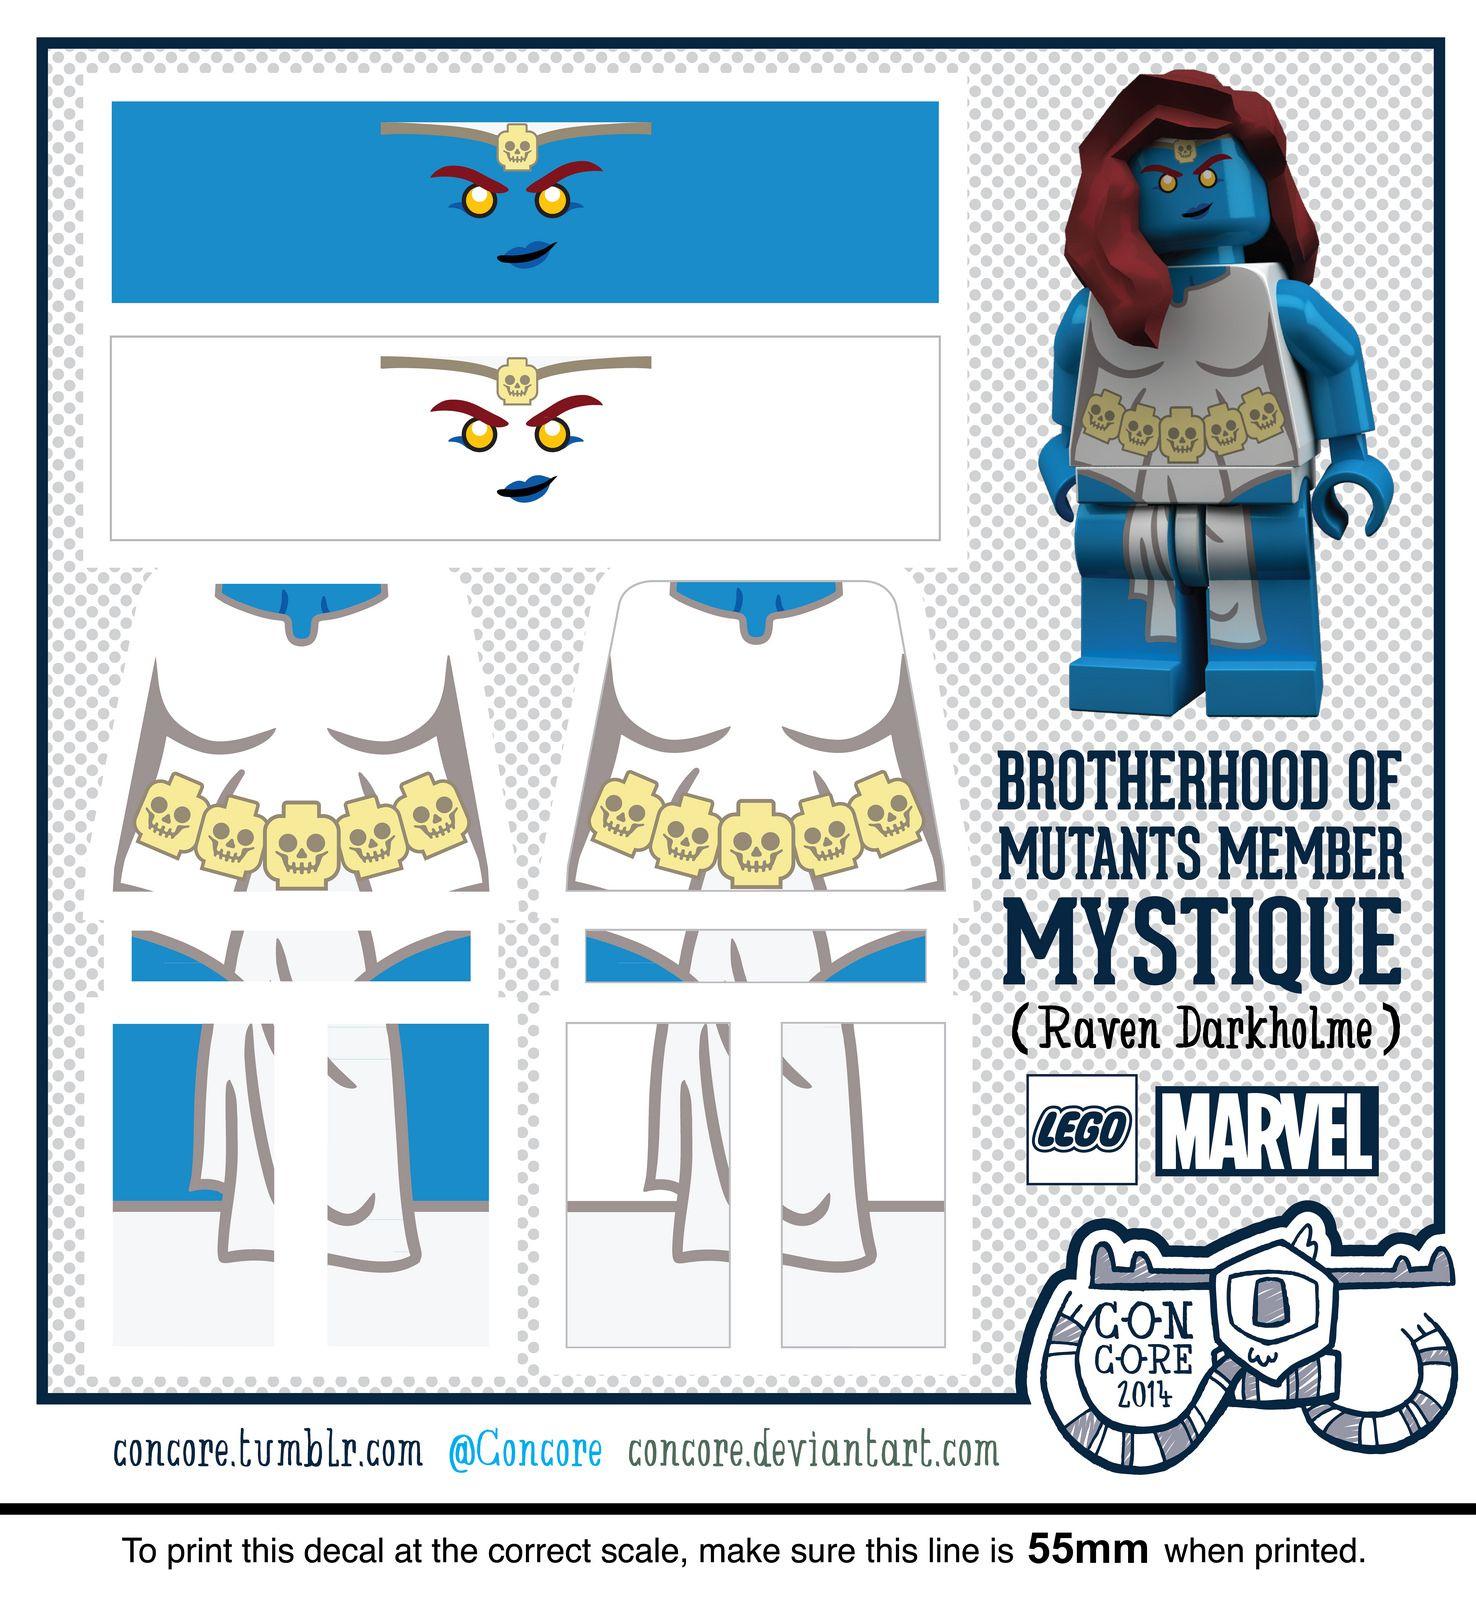 Marvels mystique custom lego minifigure decal flickr photo sharing